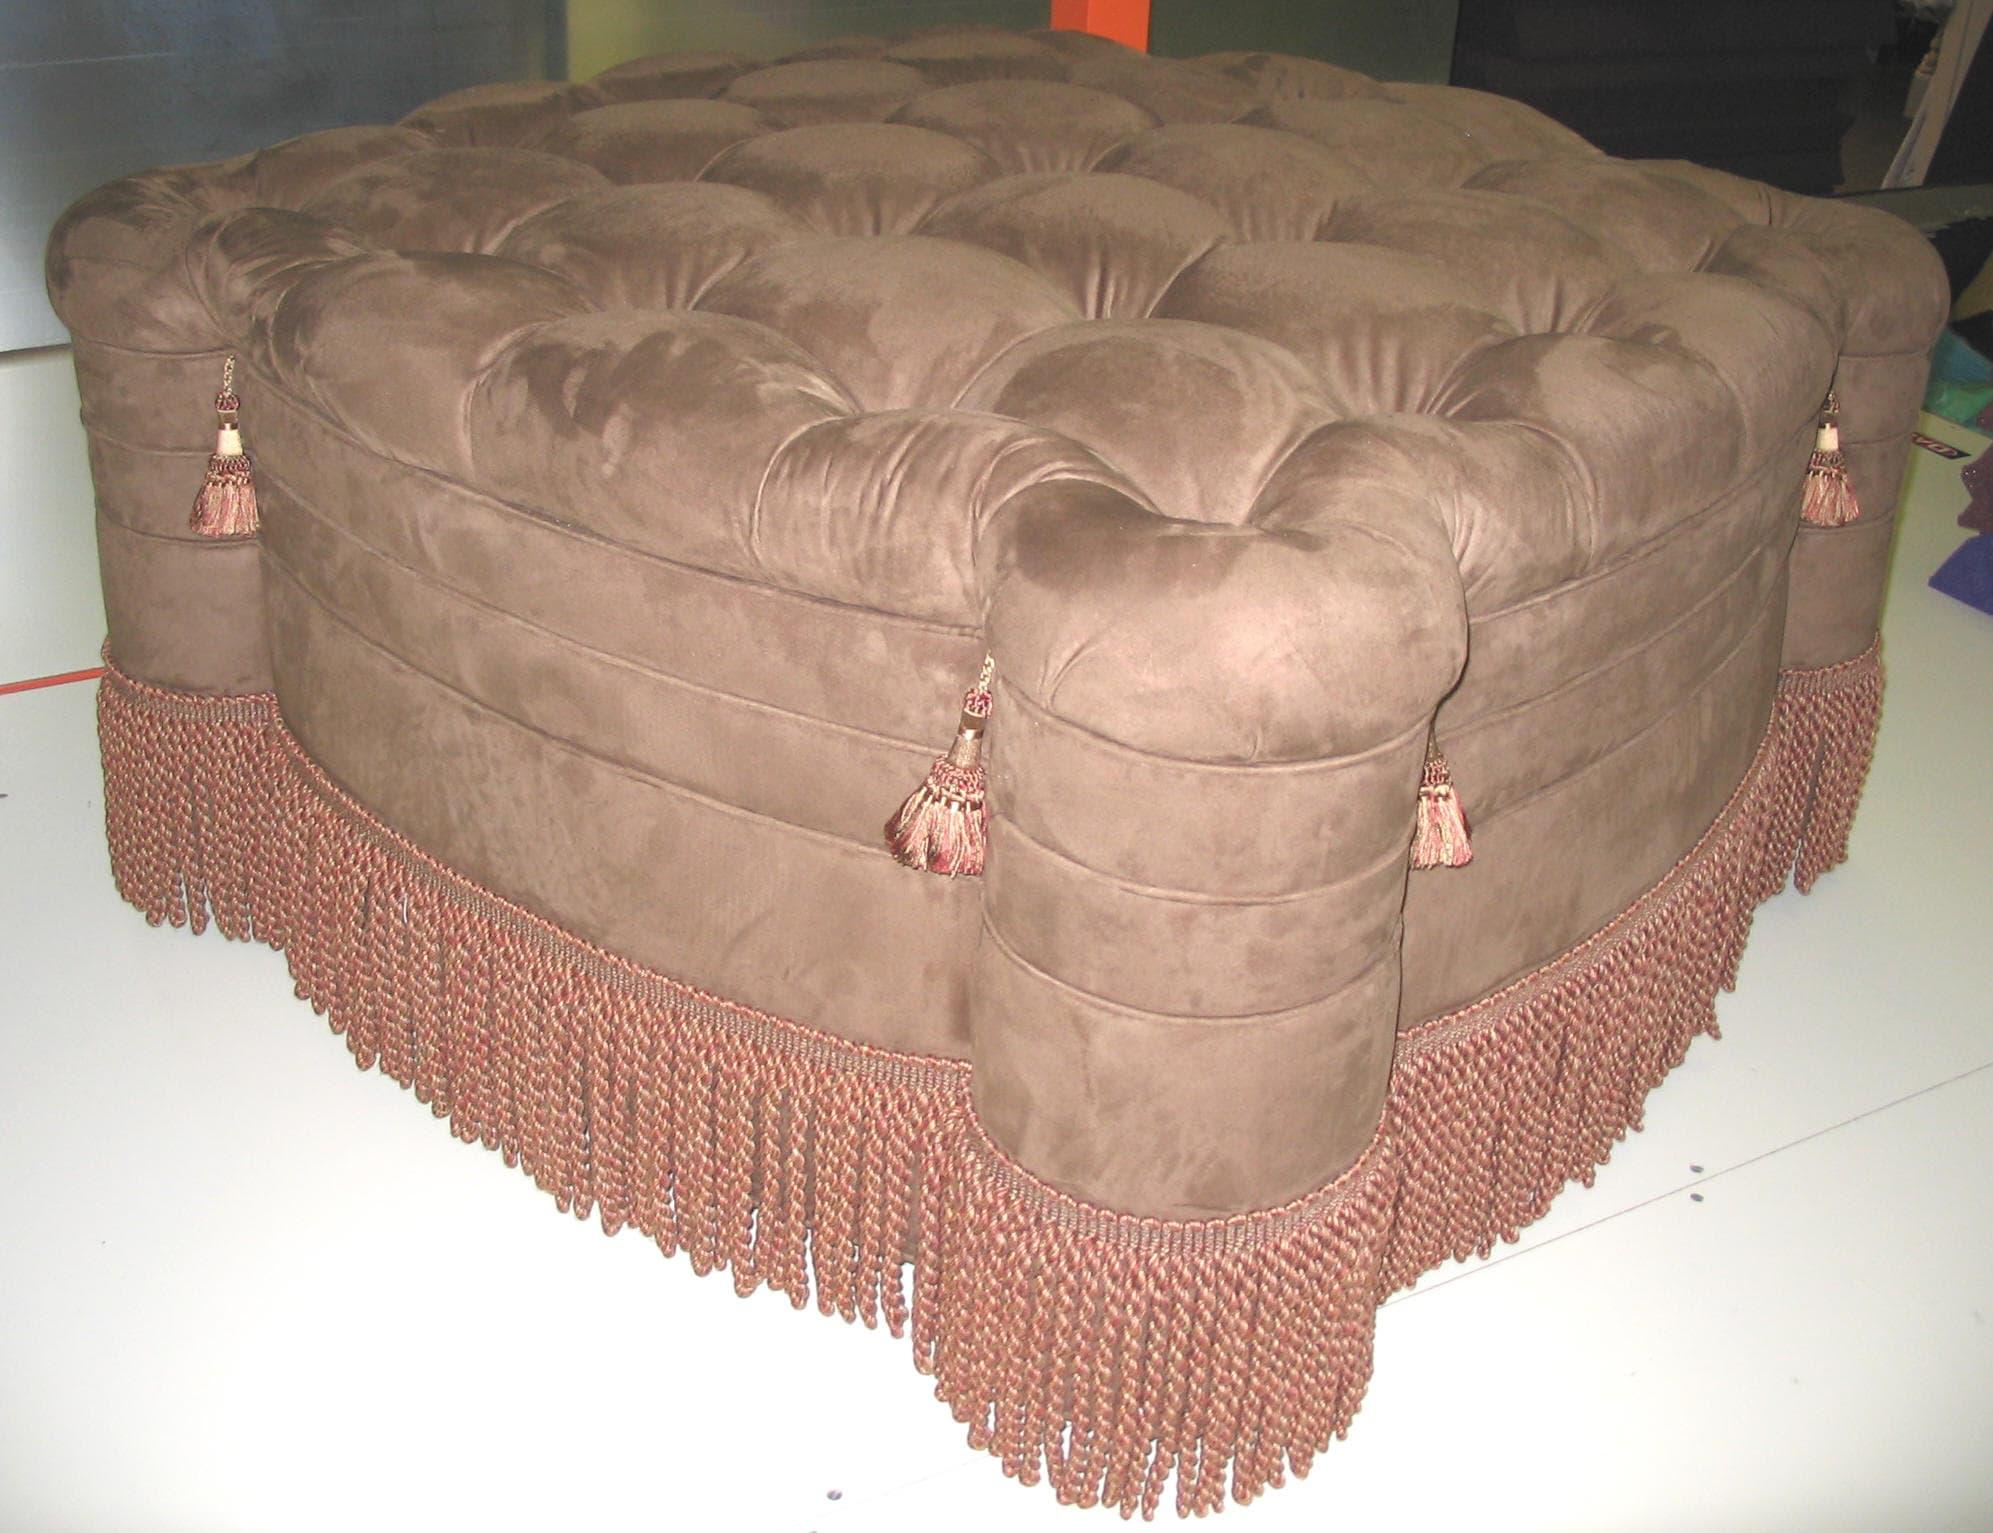 custom cut foam sofa cushion cushion replacement foam mattress foam packaging foam cushions. Black Bedroom Furniture Sets. Home Design Ideas